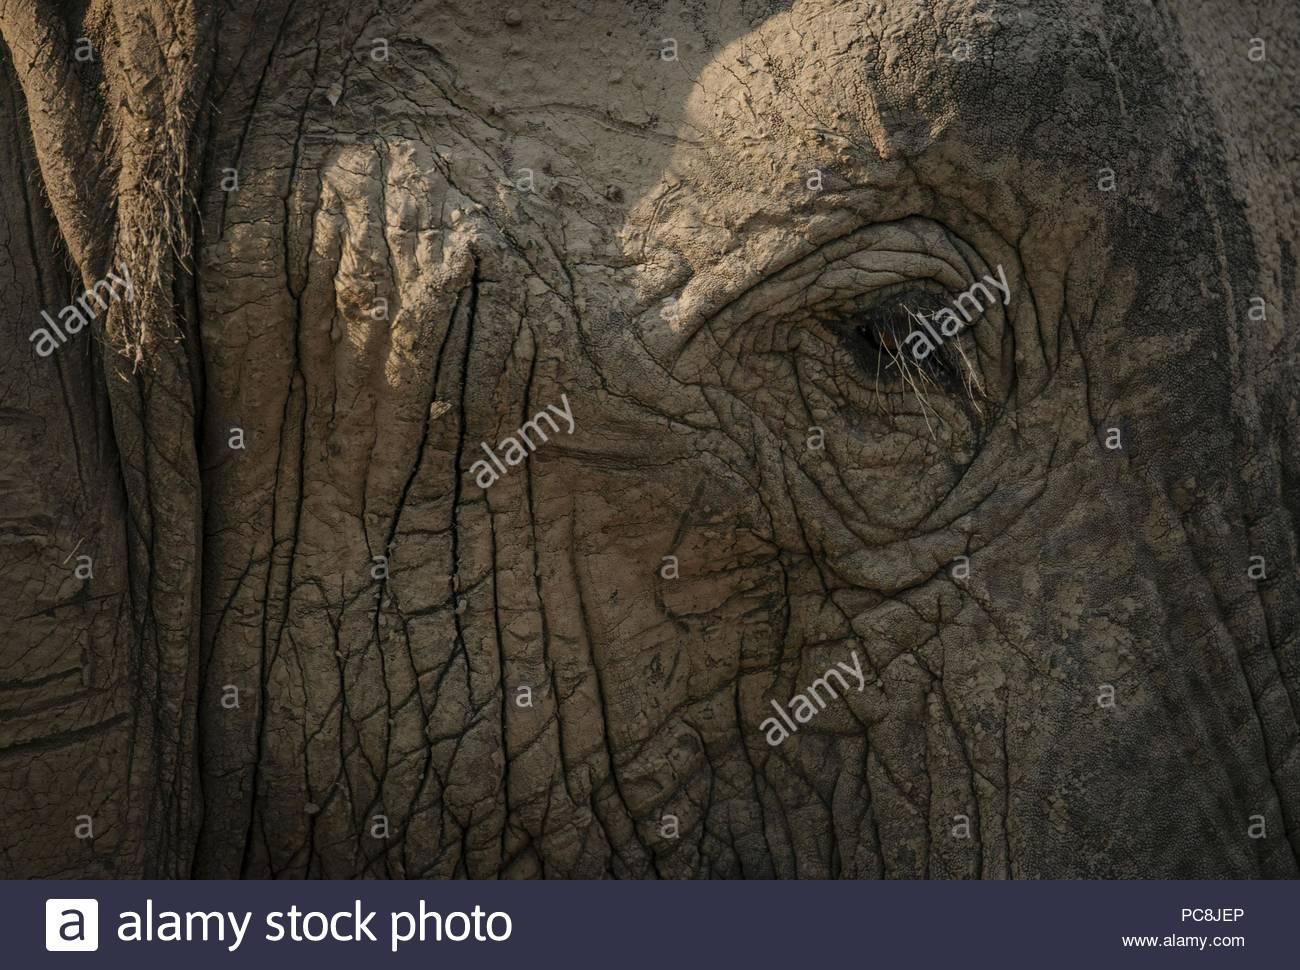 Close-up de un elefante africano, Loxodonta africana, cubiertos de barro. Imagen De Stock